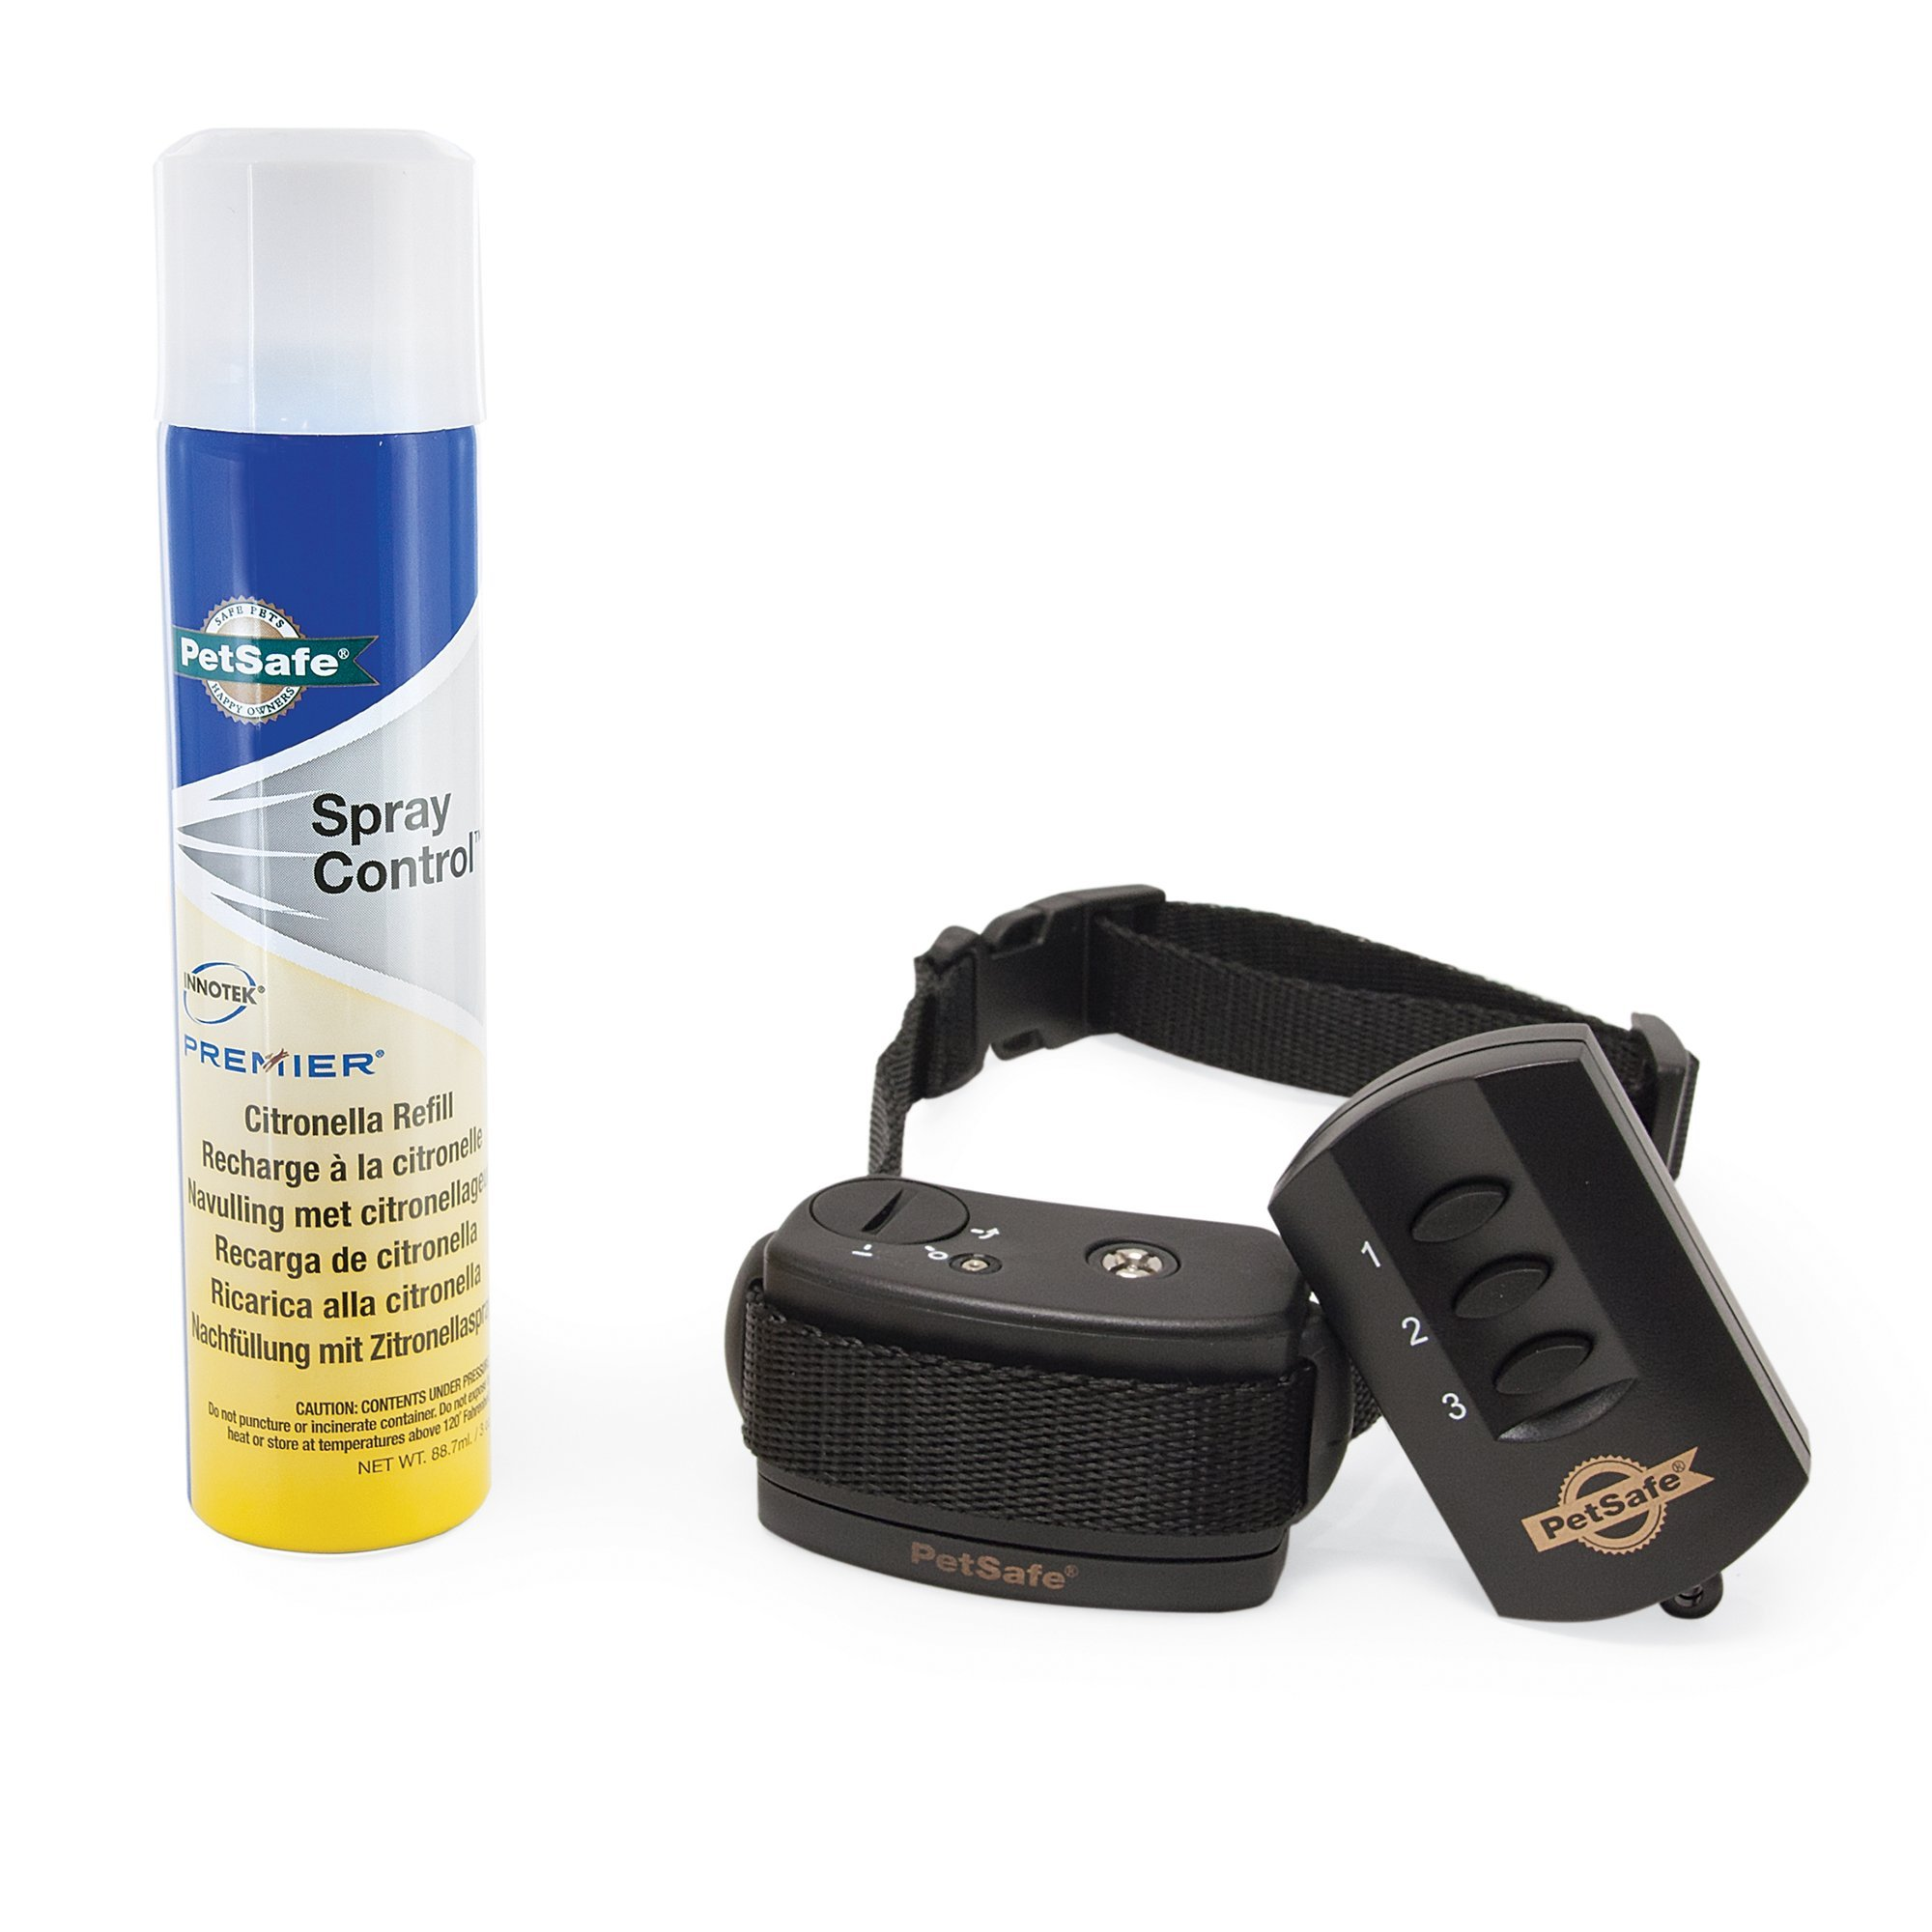 PetSafe Spray Commander Dog Trainer